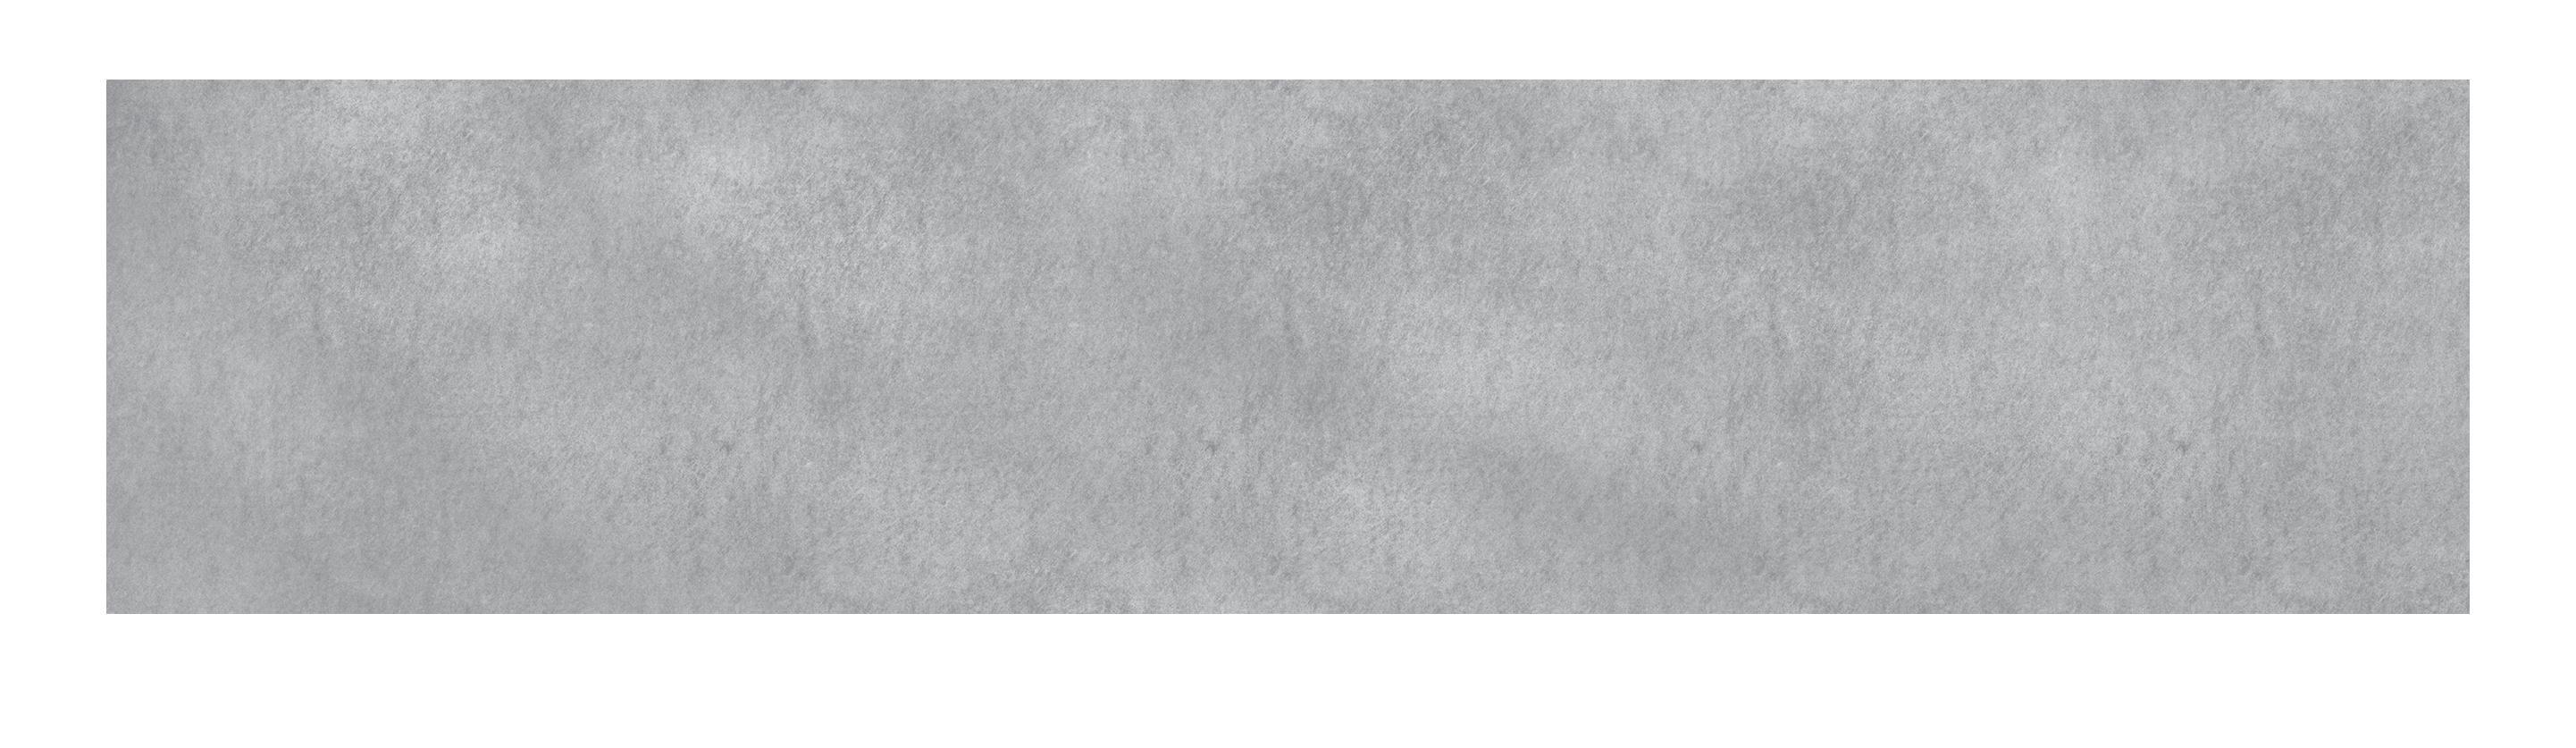 Mylyn Wood Photography: Education